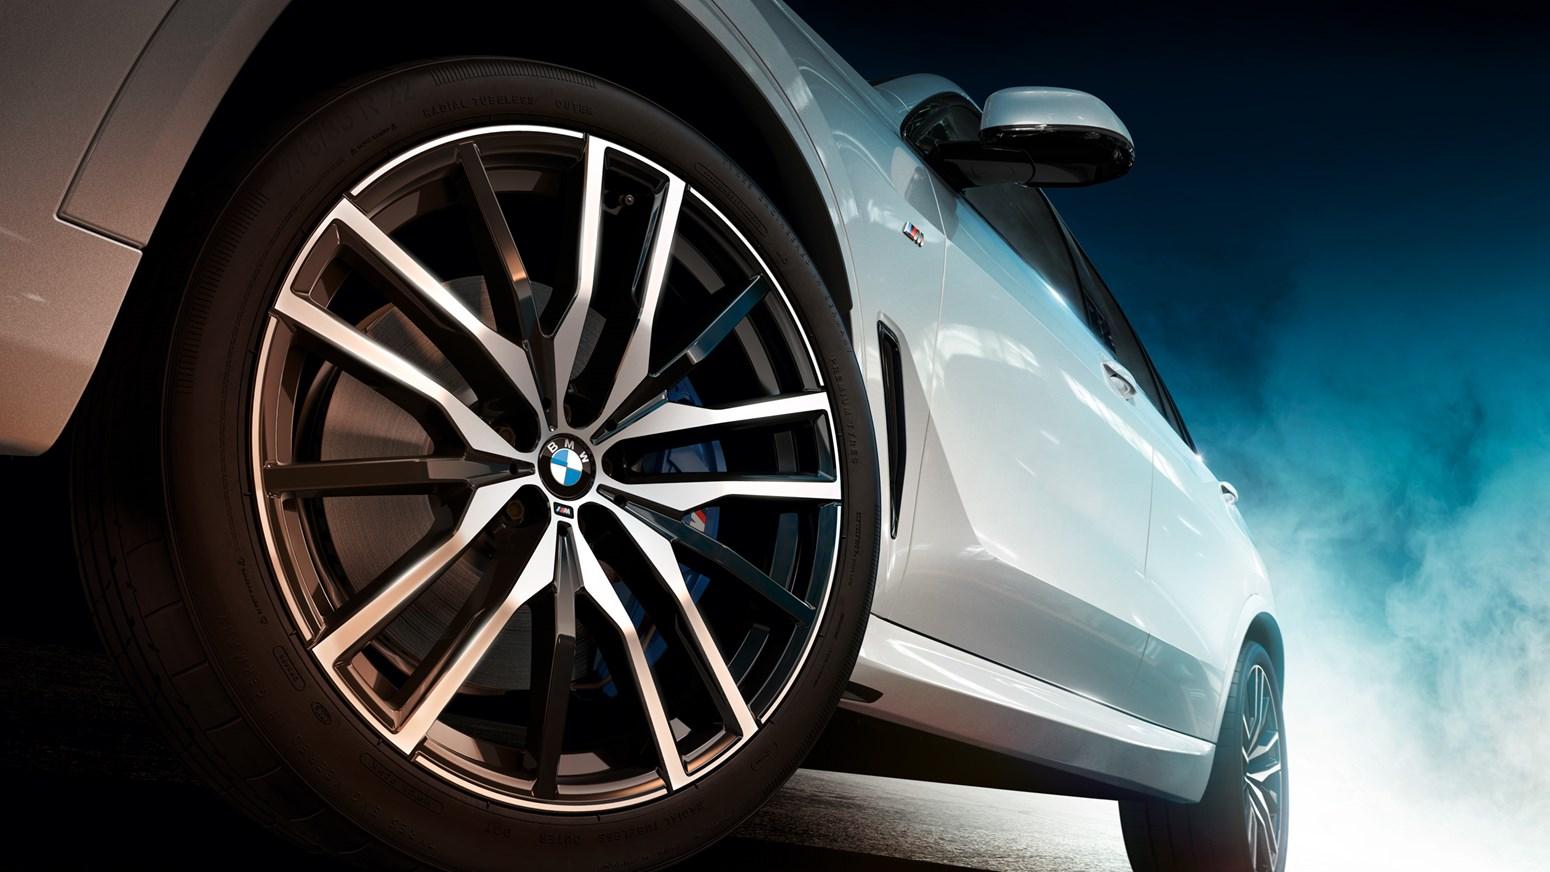 BMW X5 GALLERY 2440X1373 H